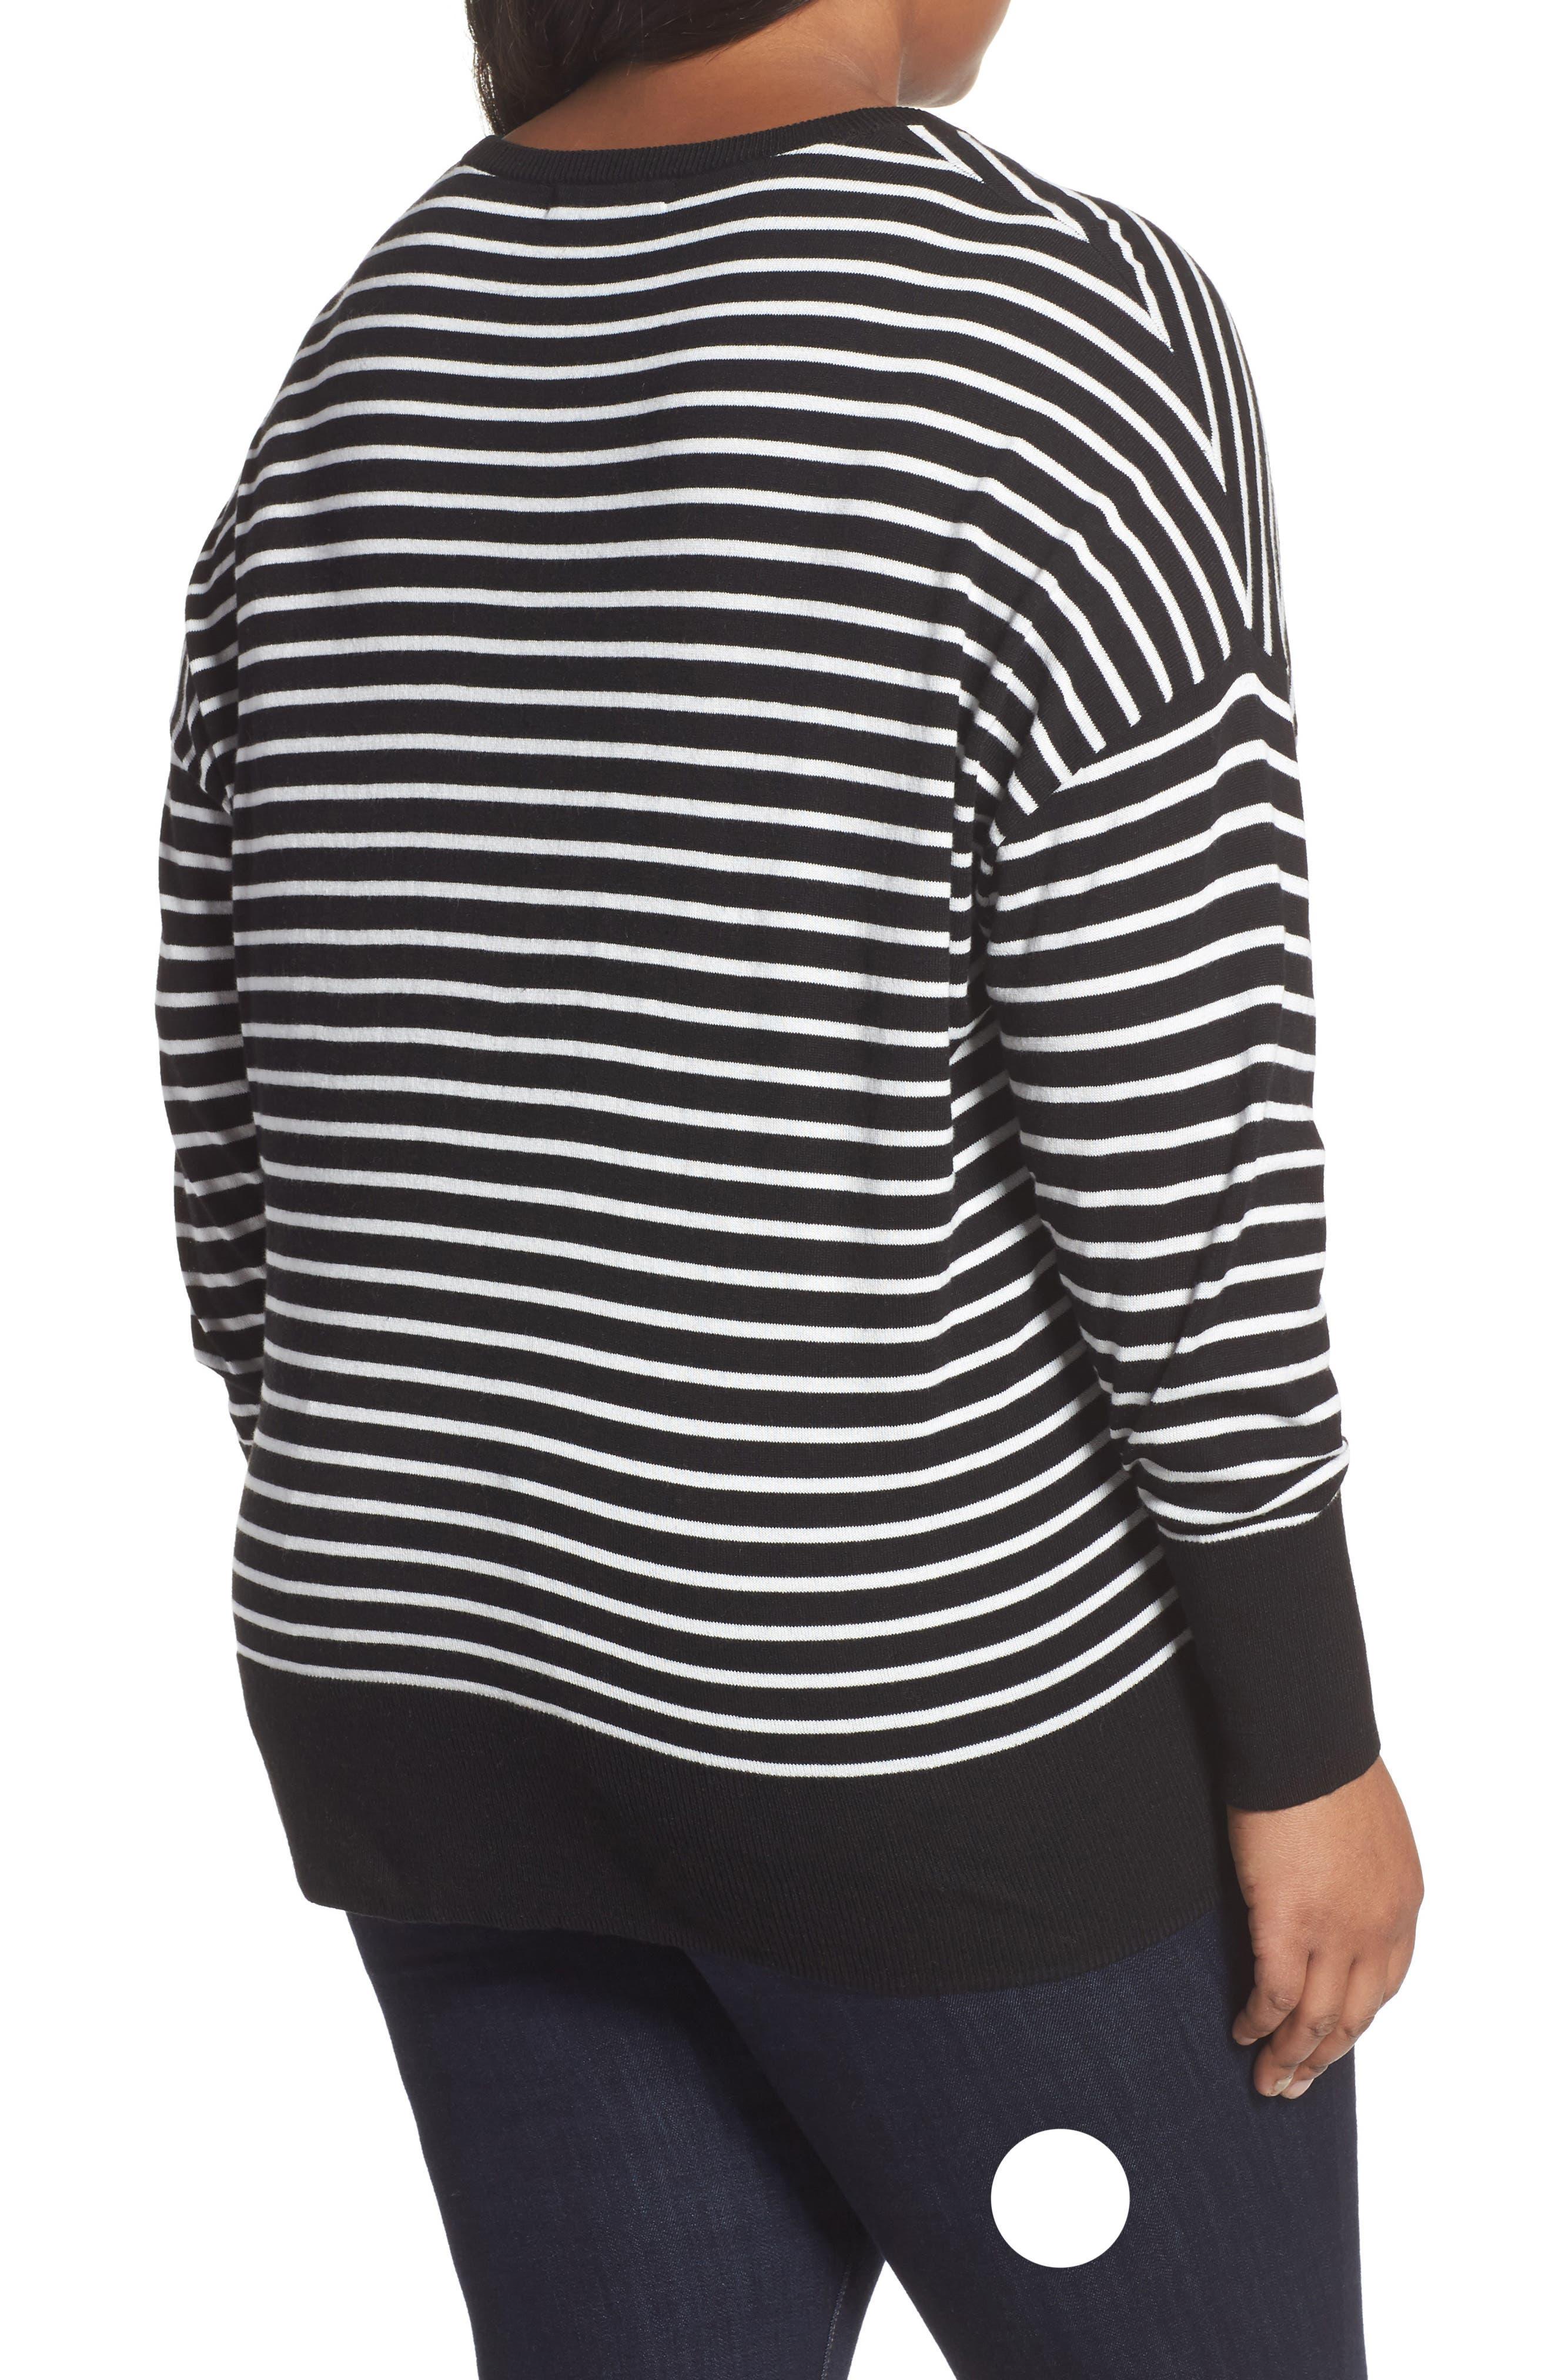 Dolman Sleeve Crewneck Sweater,                             Alternate thumbnail 2, color,                             002